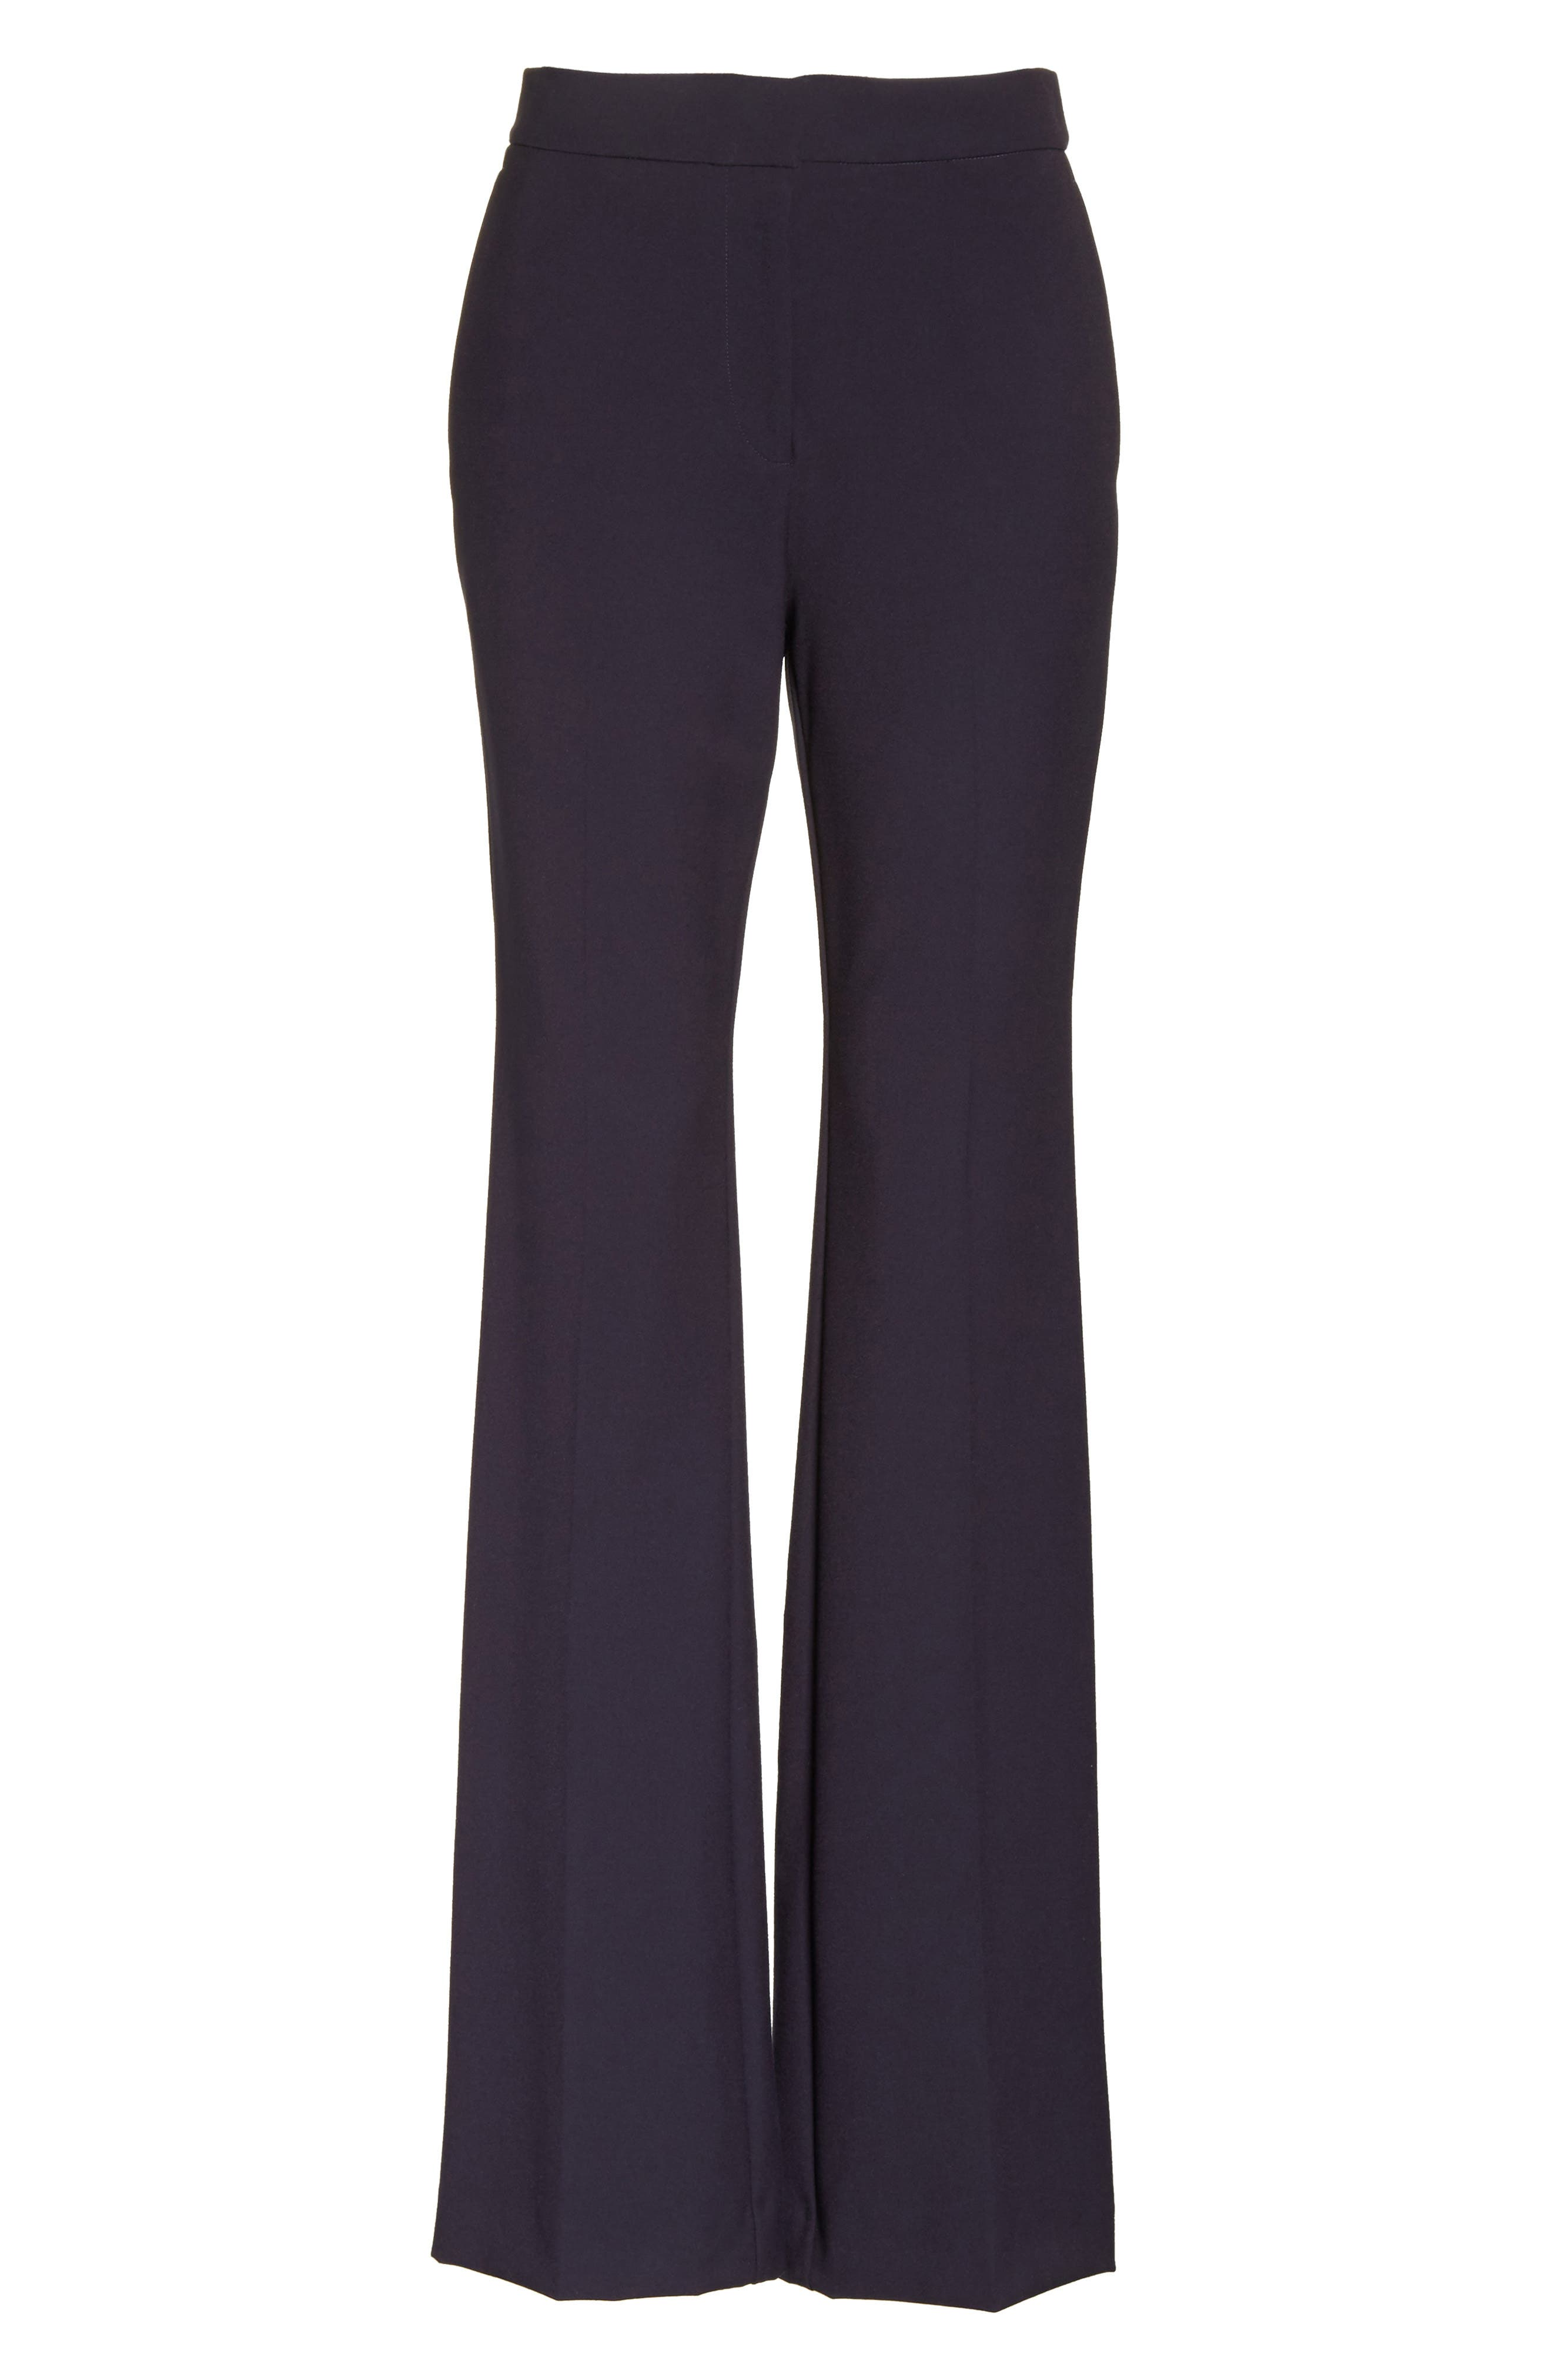 Stretch Suit Pants,                             Alternate thumbnail 6, color,                             Dark Navy